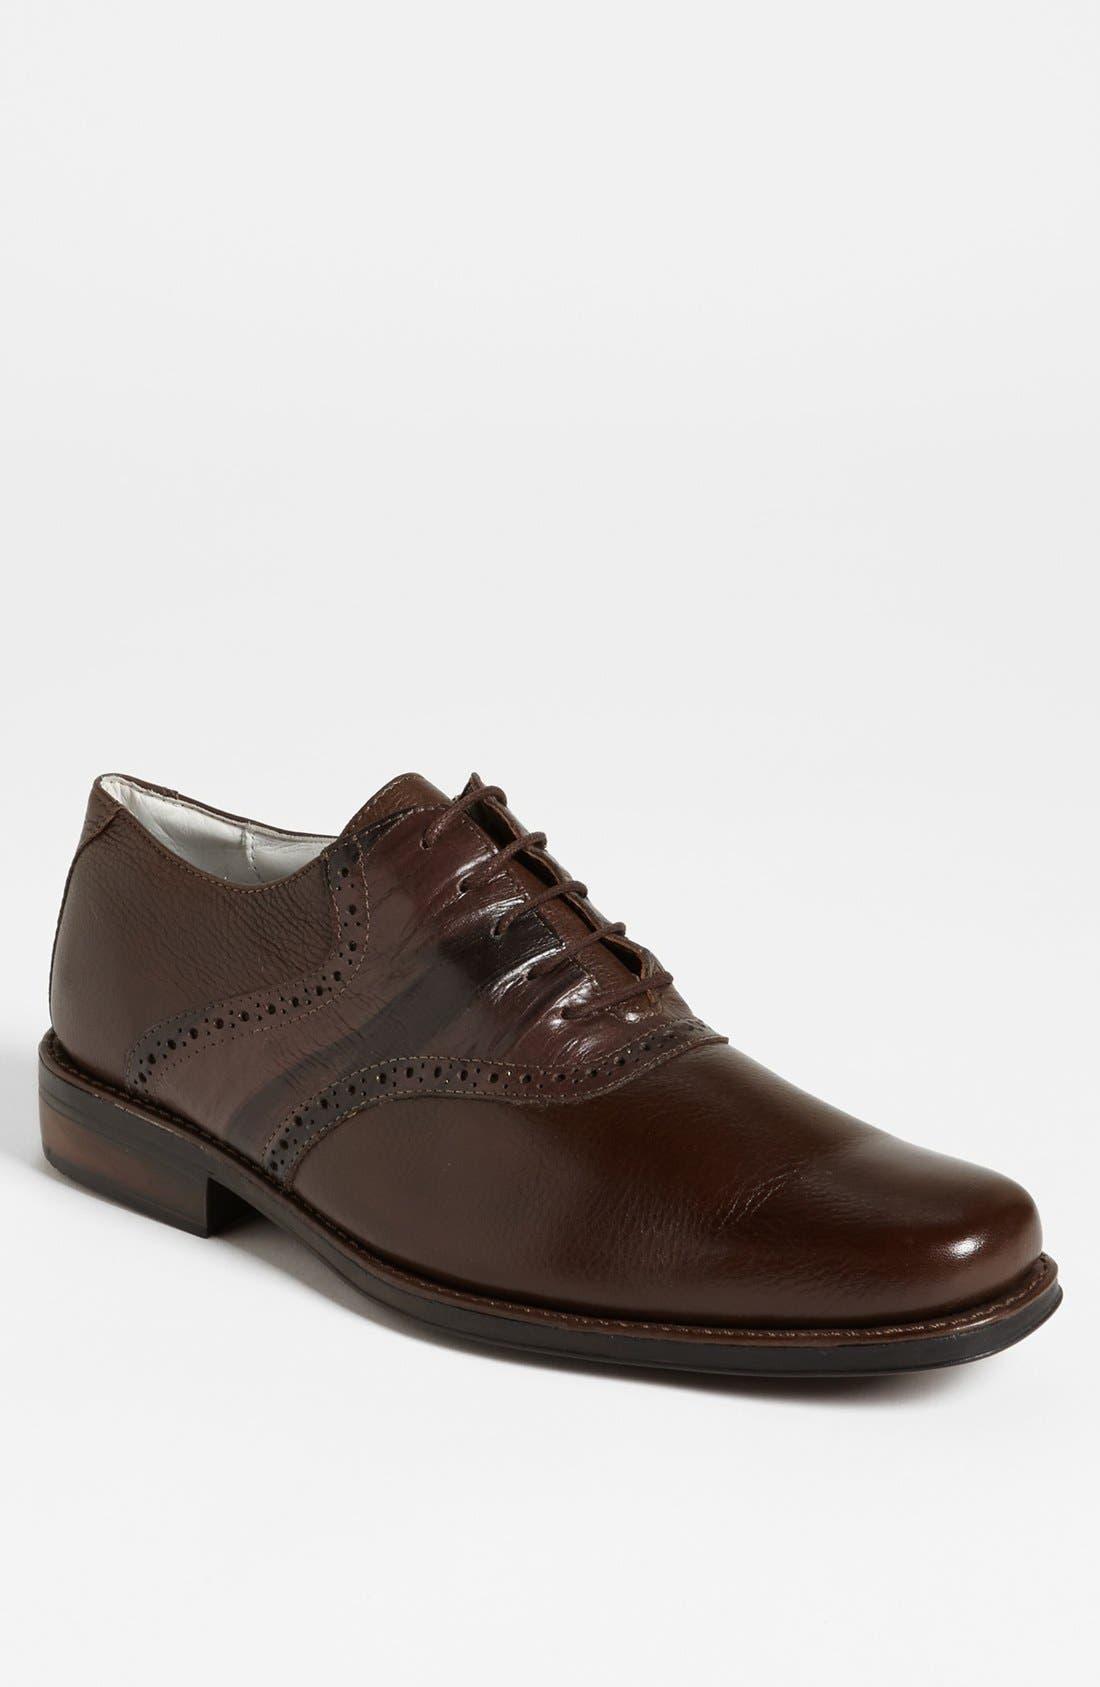 Alternate Image 1 Selected - Sandro Moscoloni 'Kindred' Saddle Shoe